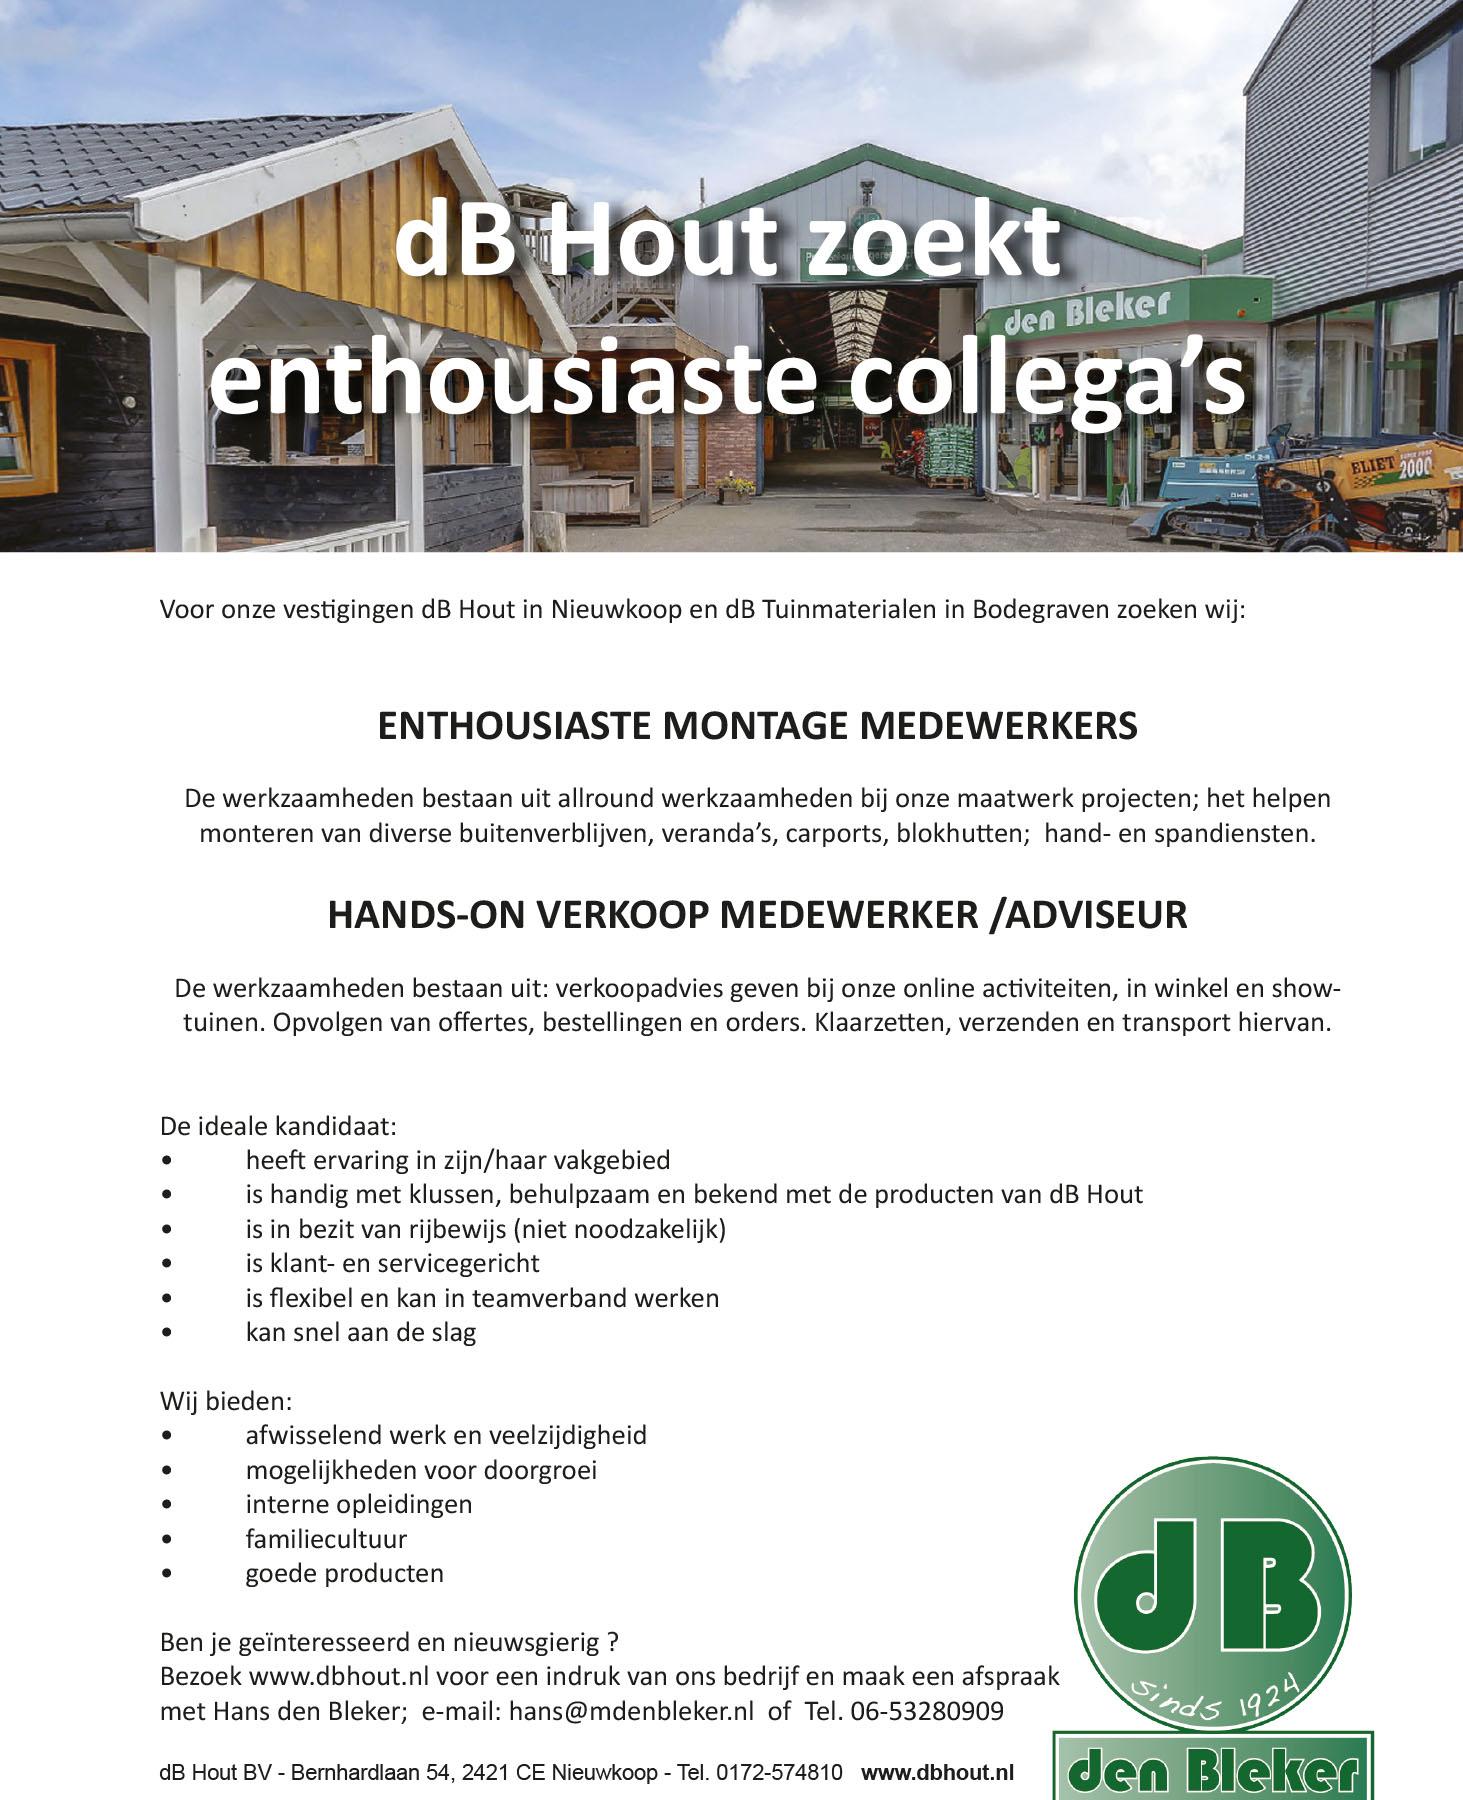 dB Hout zoekt per direct enthousiaste collega's